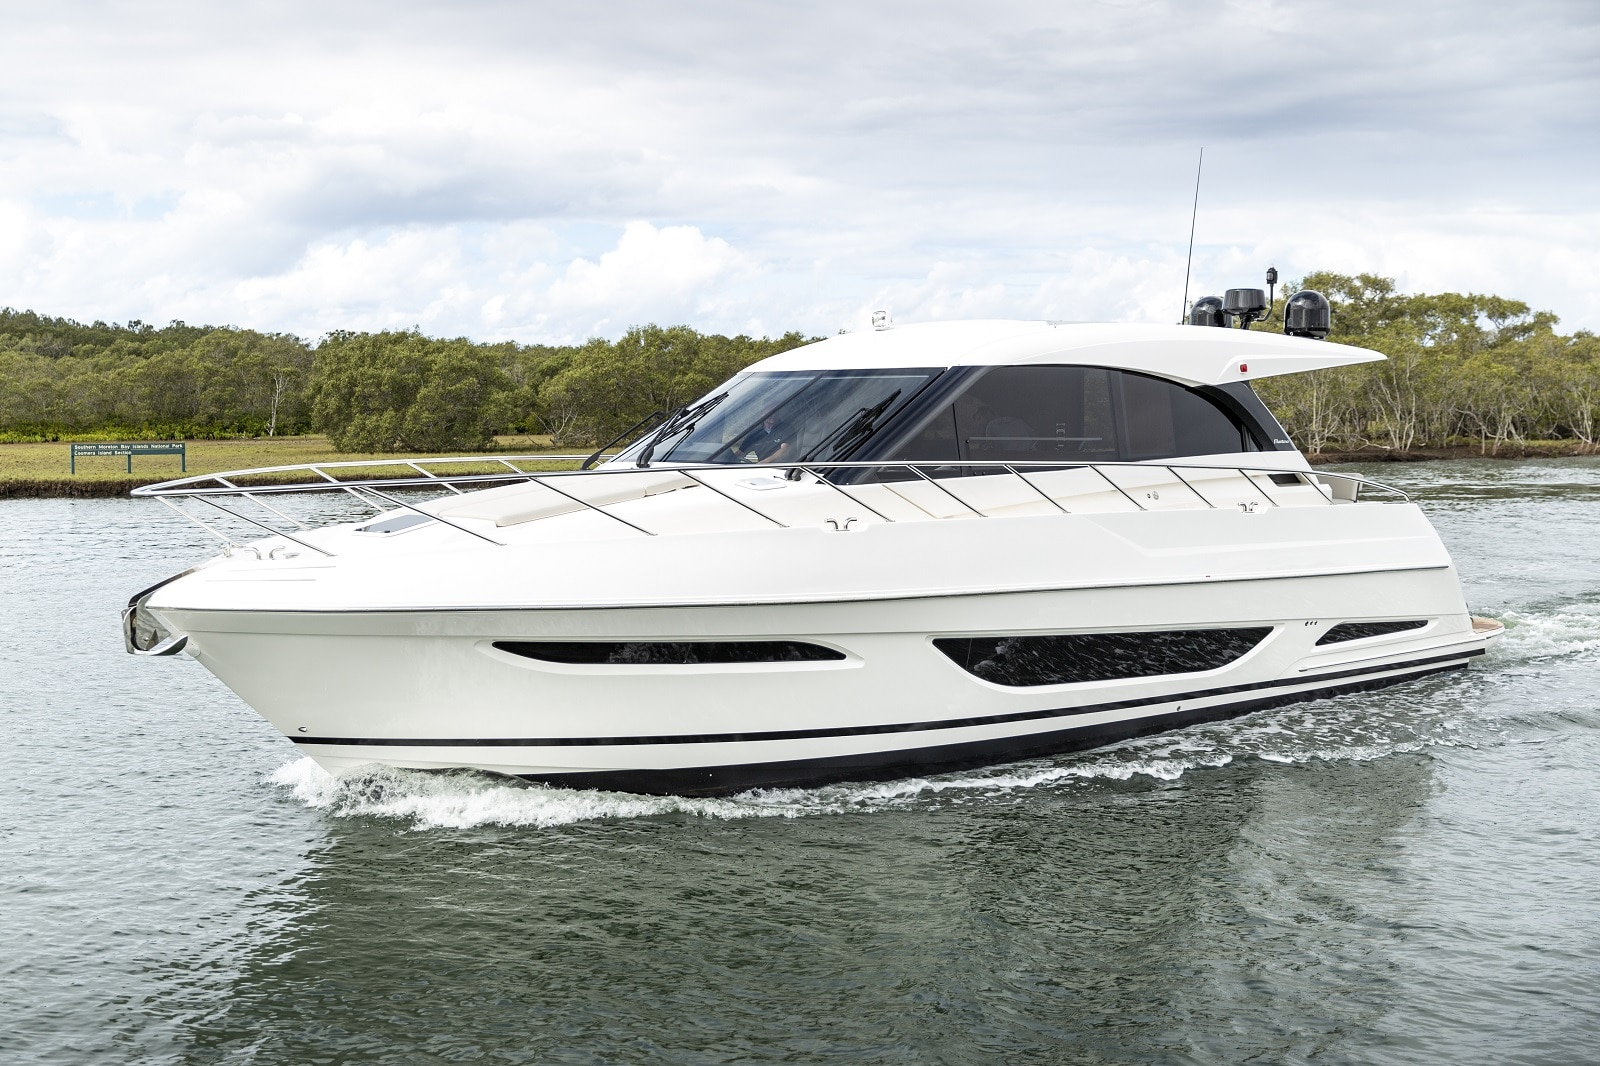 New Maritimo X50 Yacht